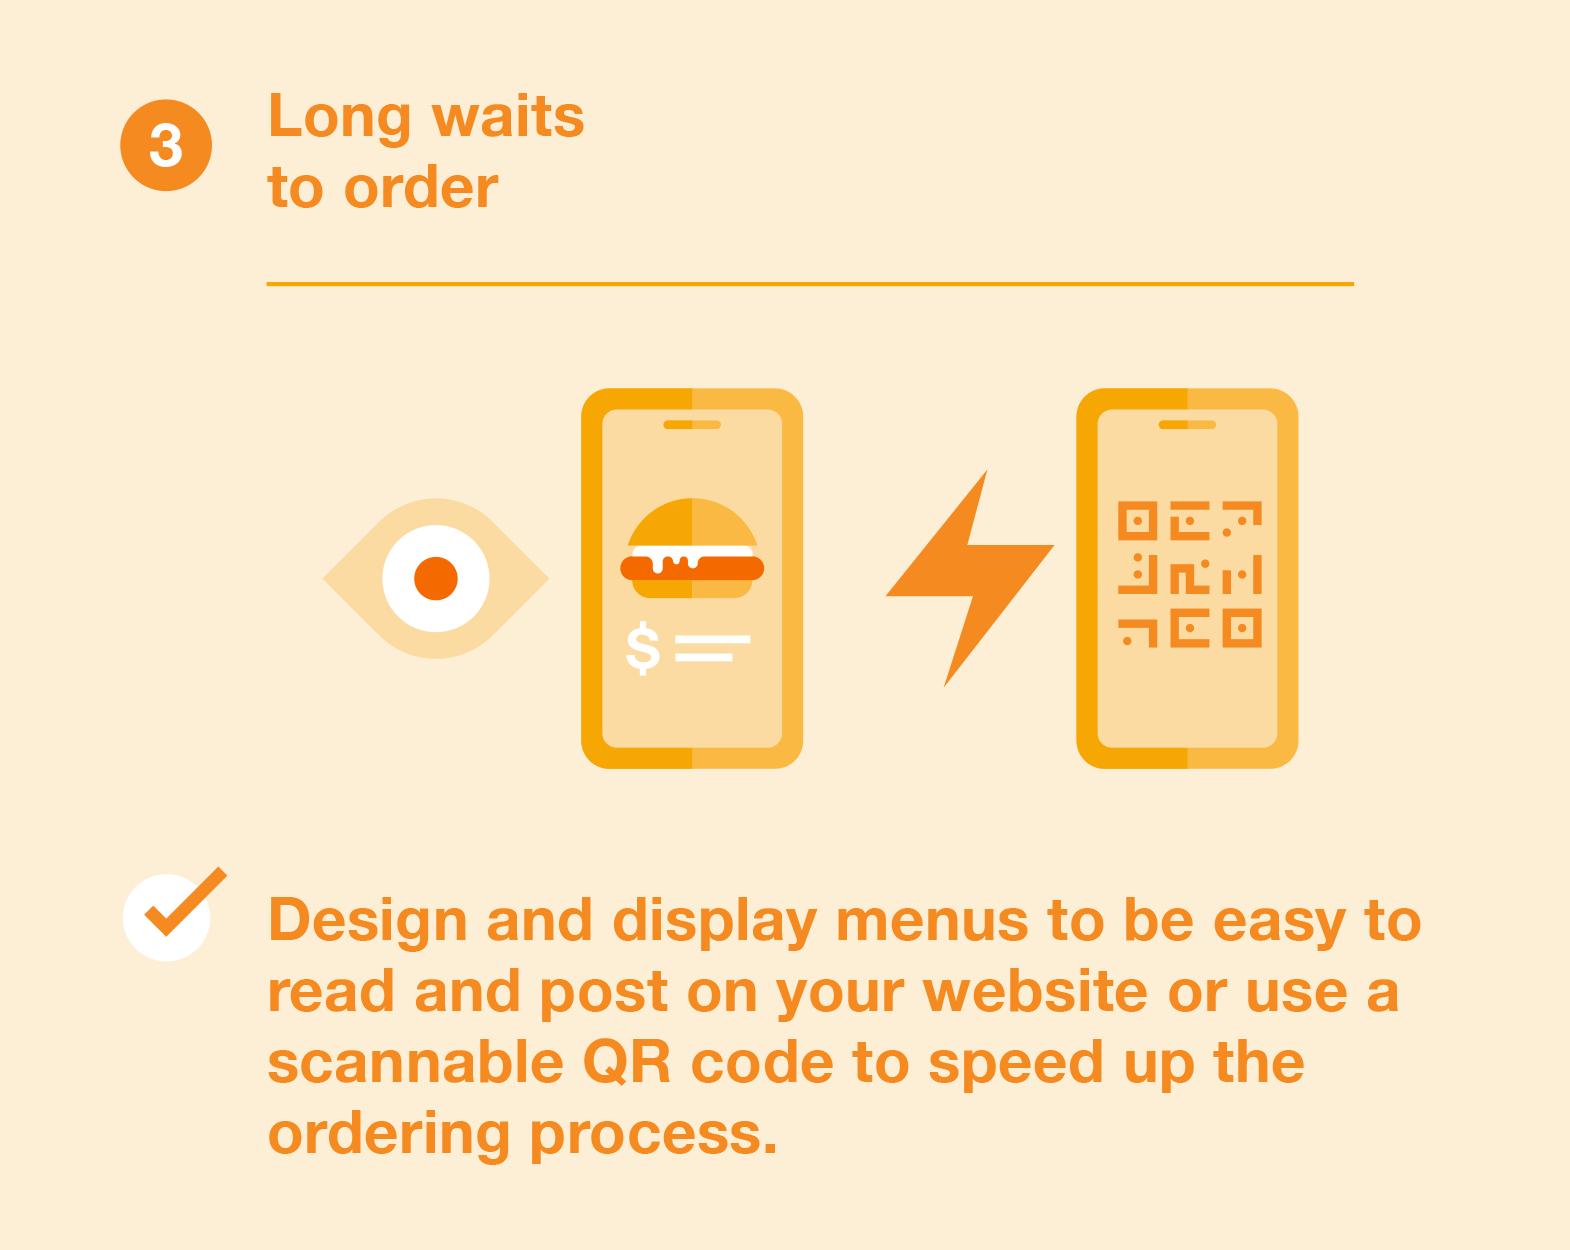 Longer waits to order